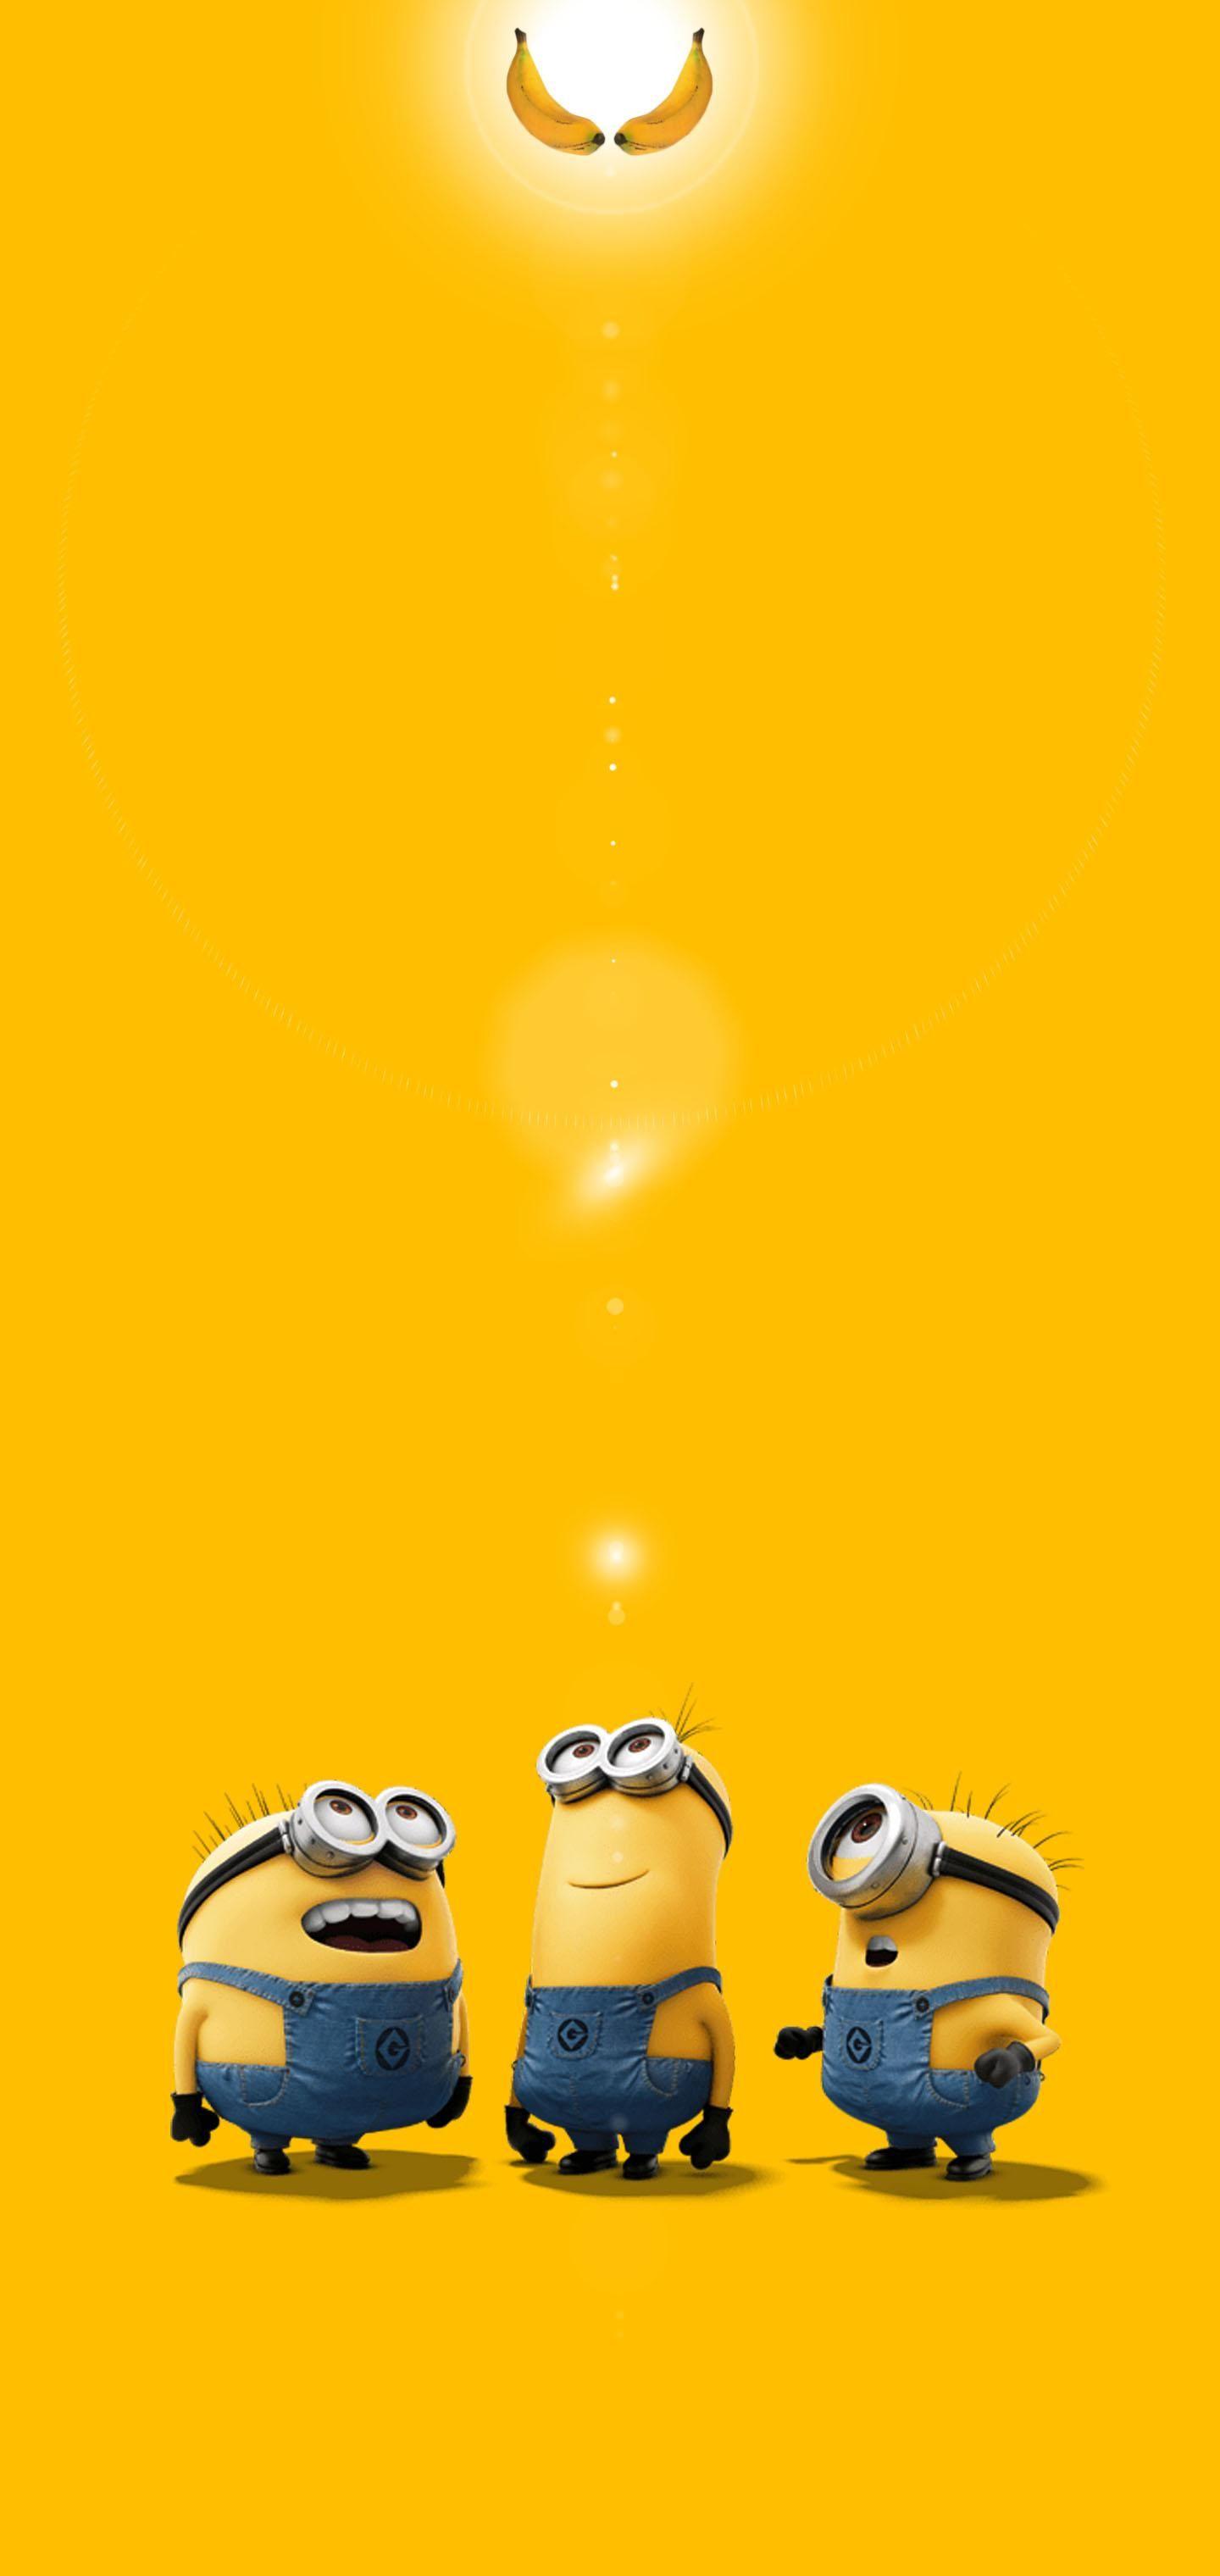 Gn 011 In 2020 Cute Minions Wallpaper Minions Wallpaper Minion Wallpaper Iphone